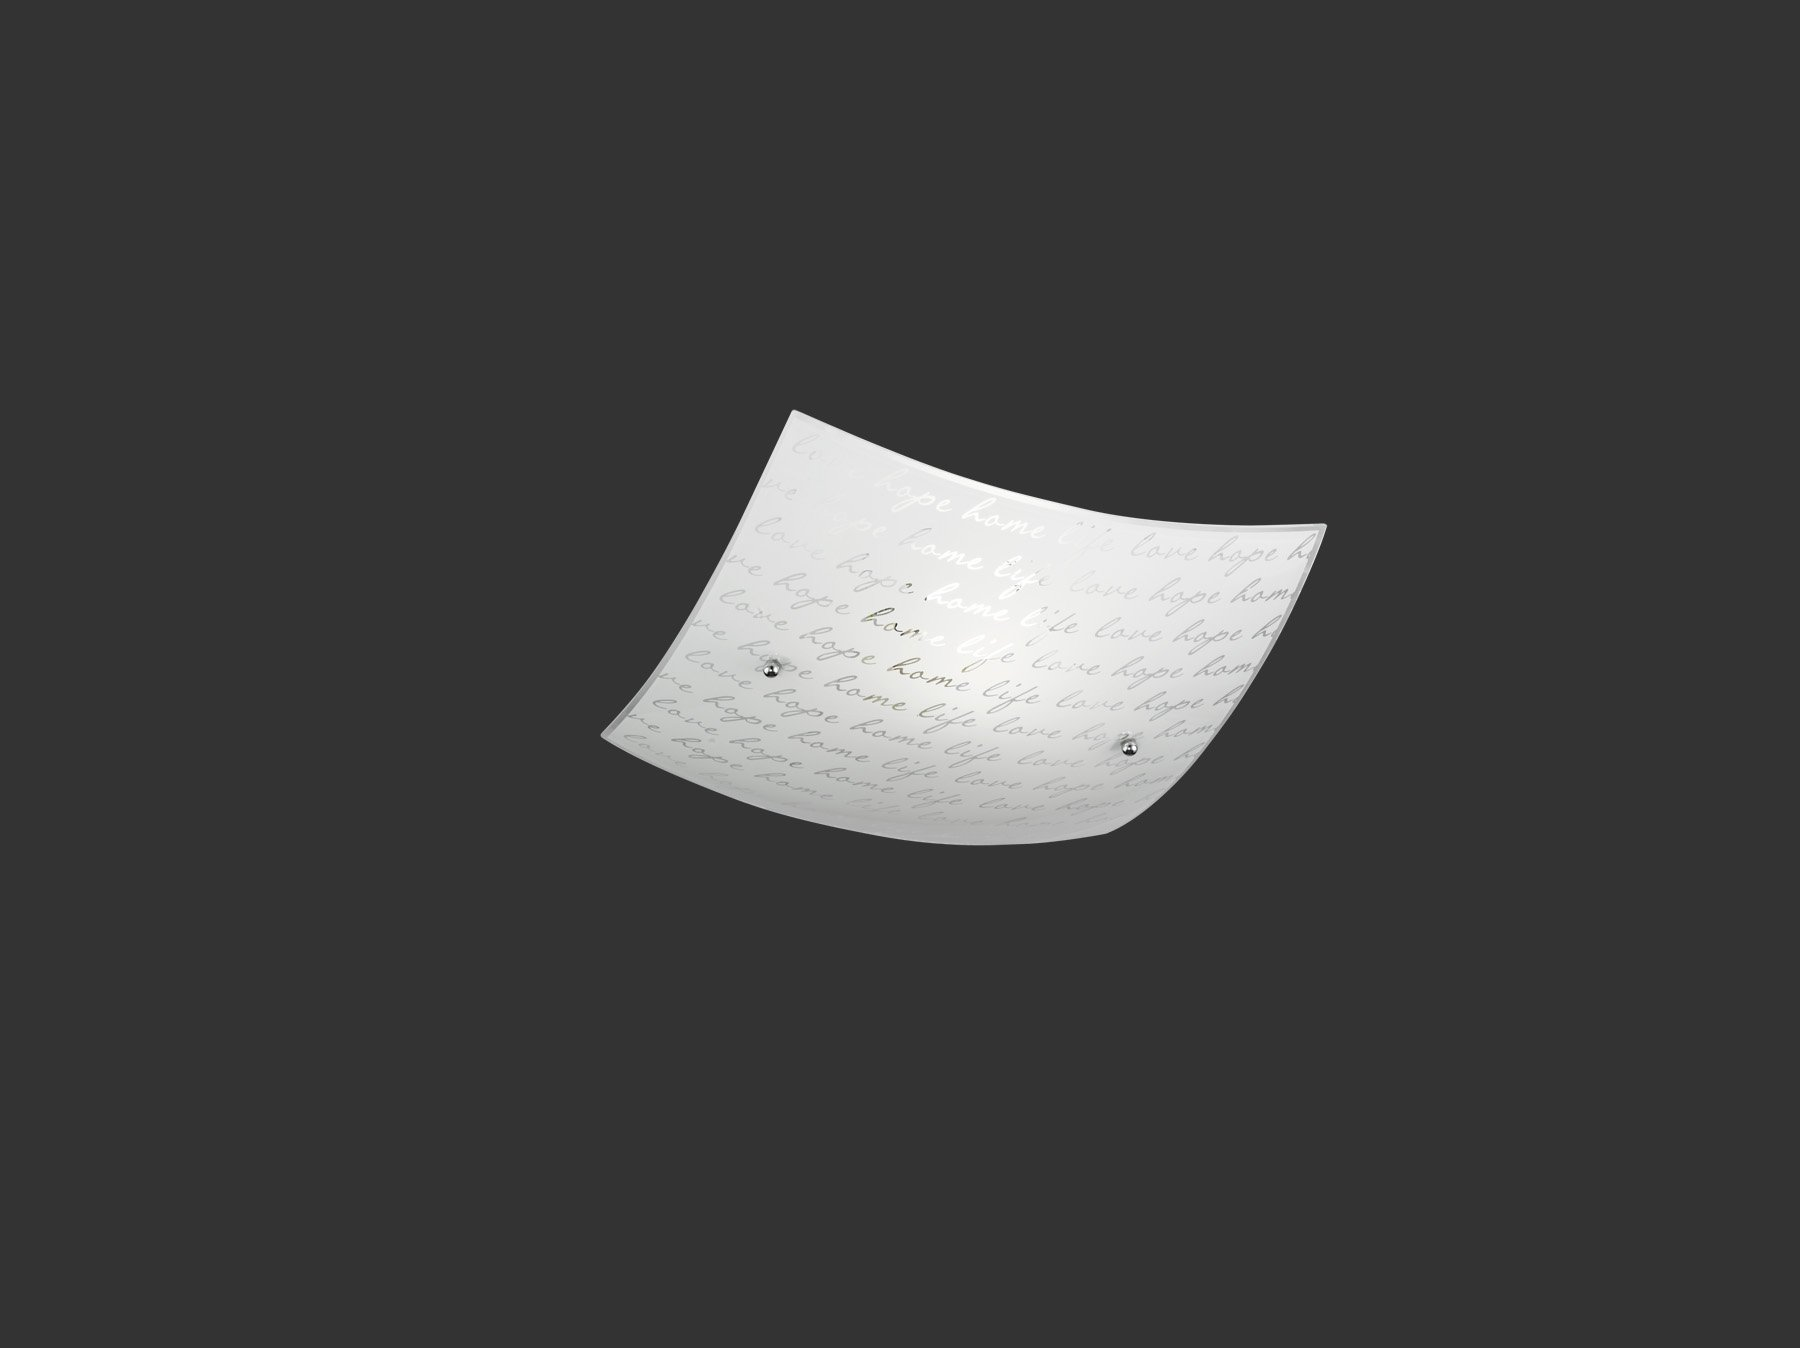 Plafoniera Quadrata Led : Signa plafoniera quadrata vetro decoro firma d cm nr